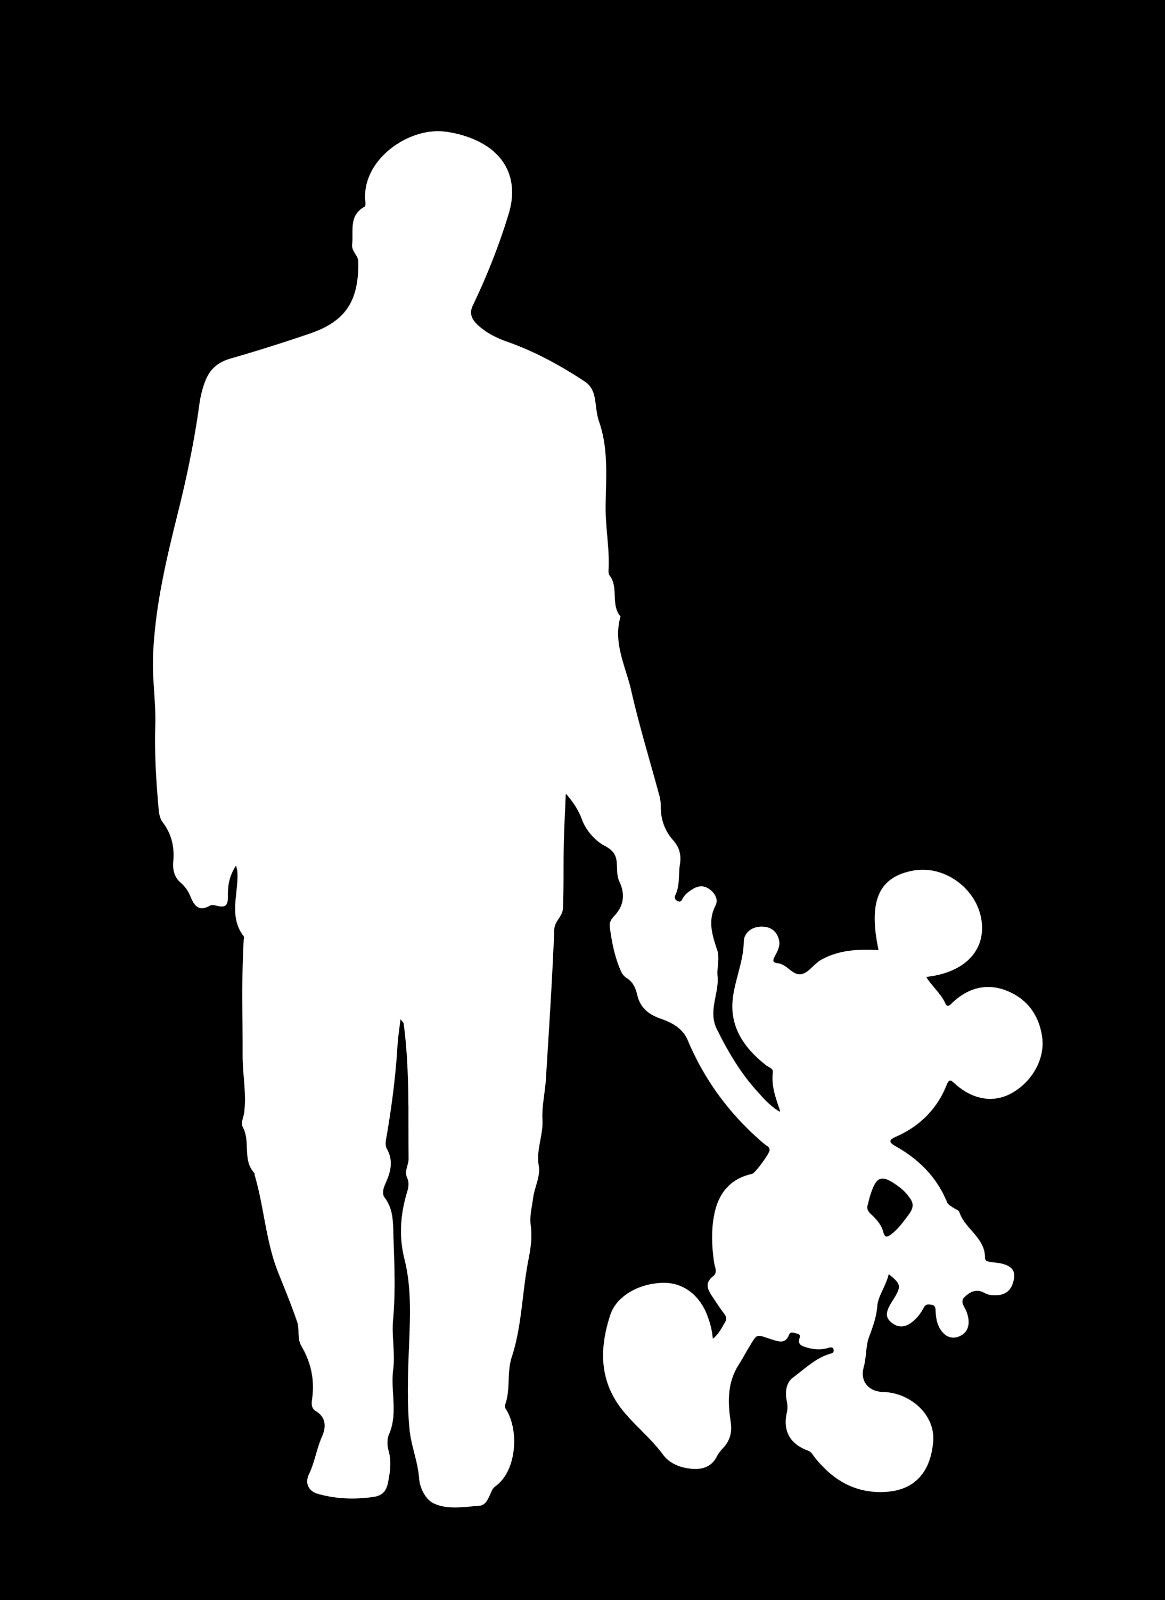 1165x1600 Walt Disney And Mickey Mouse Walking Disney World Decal Car Case